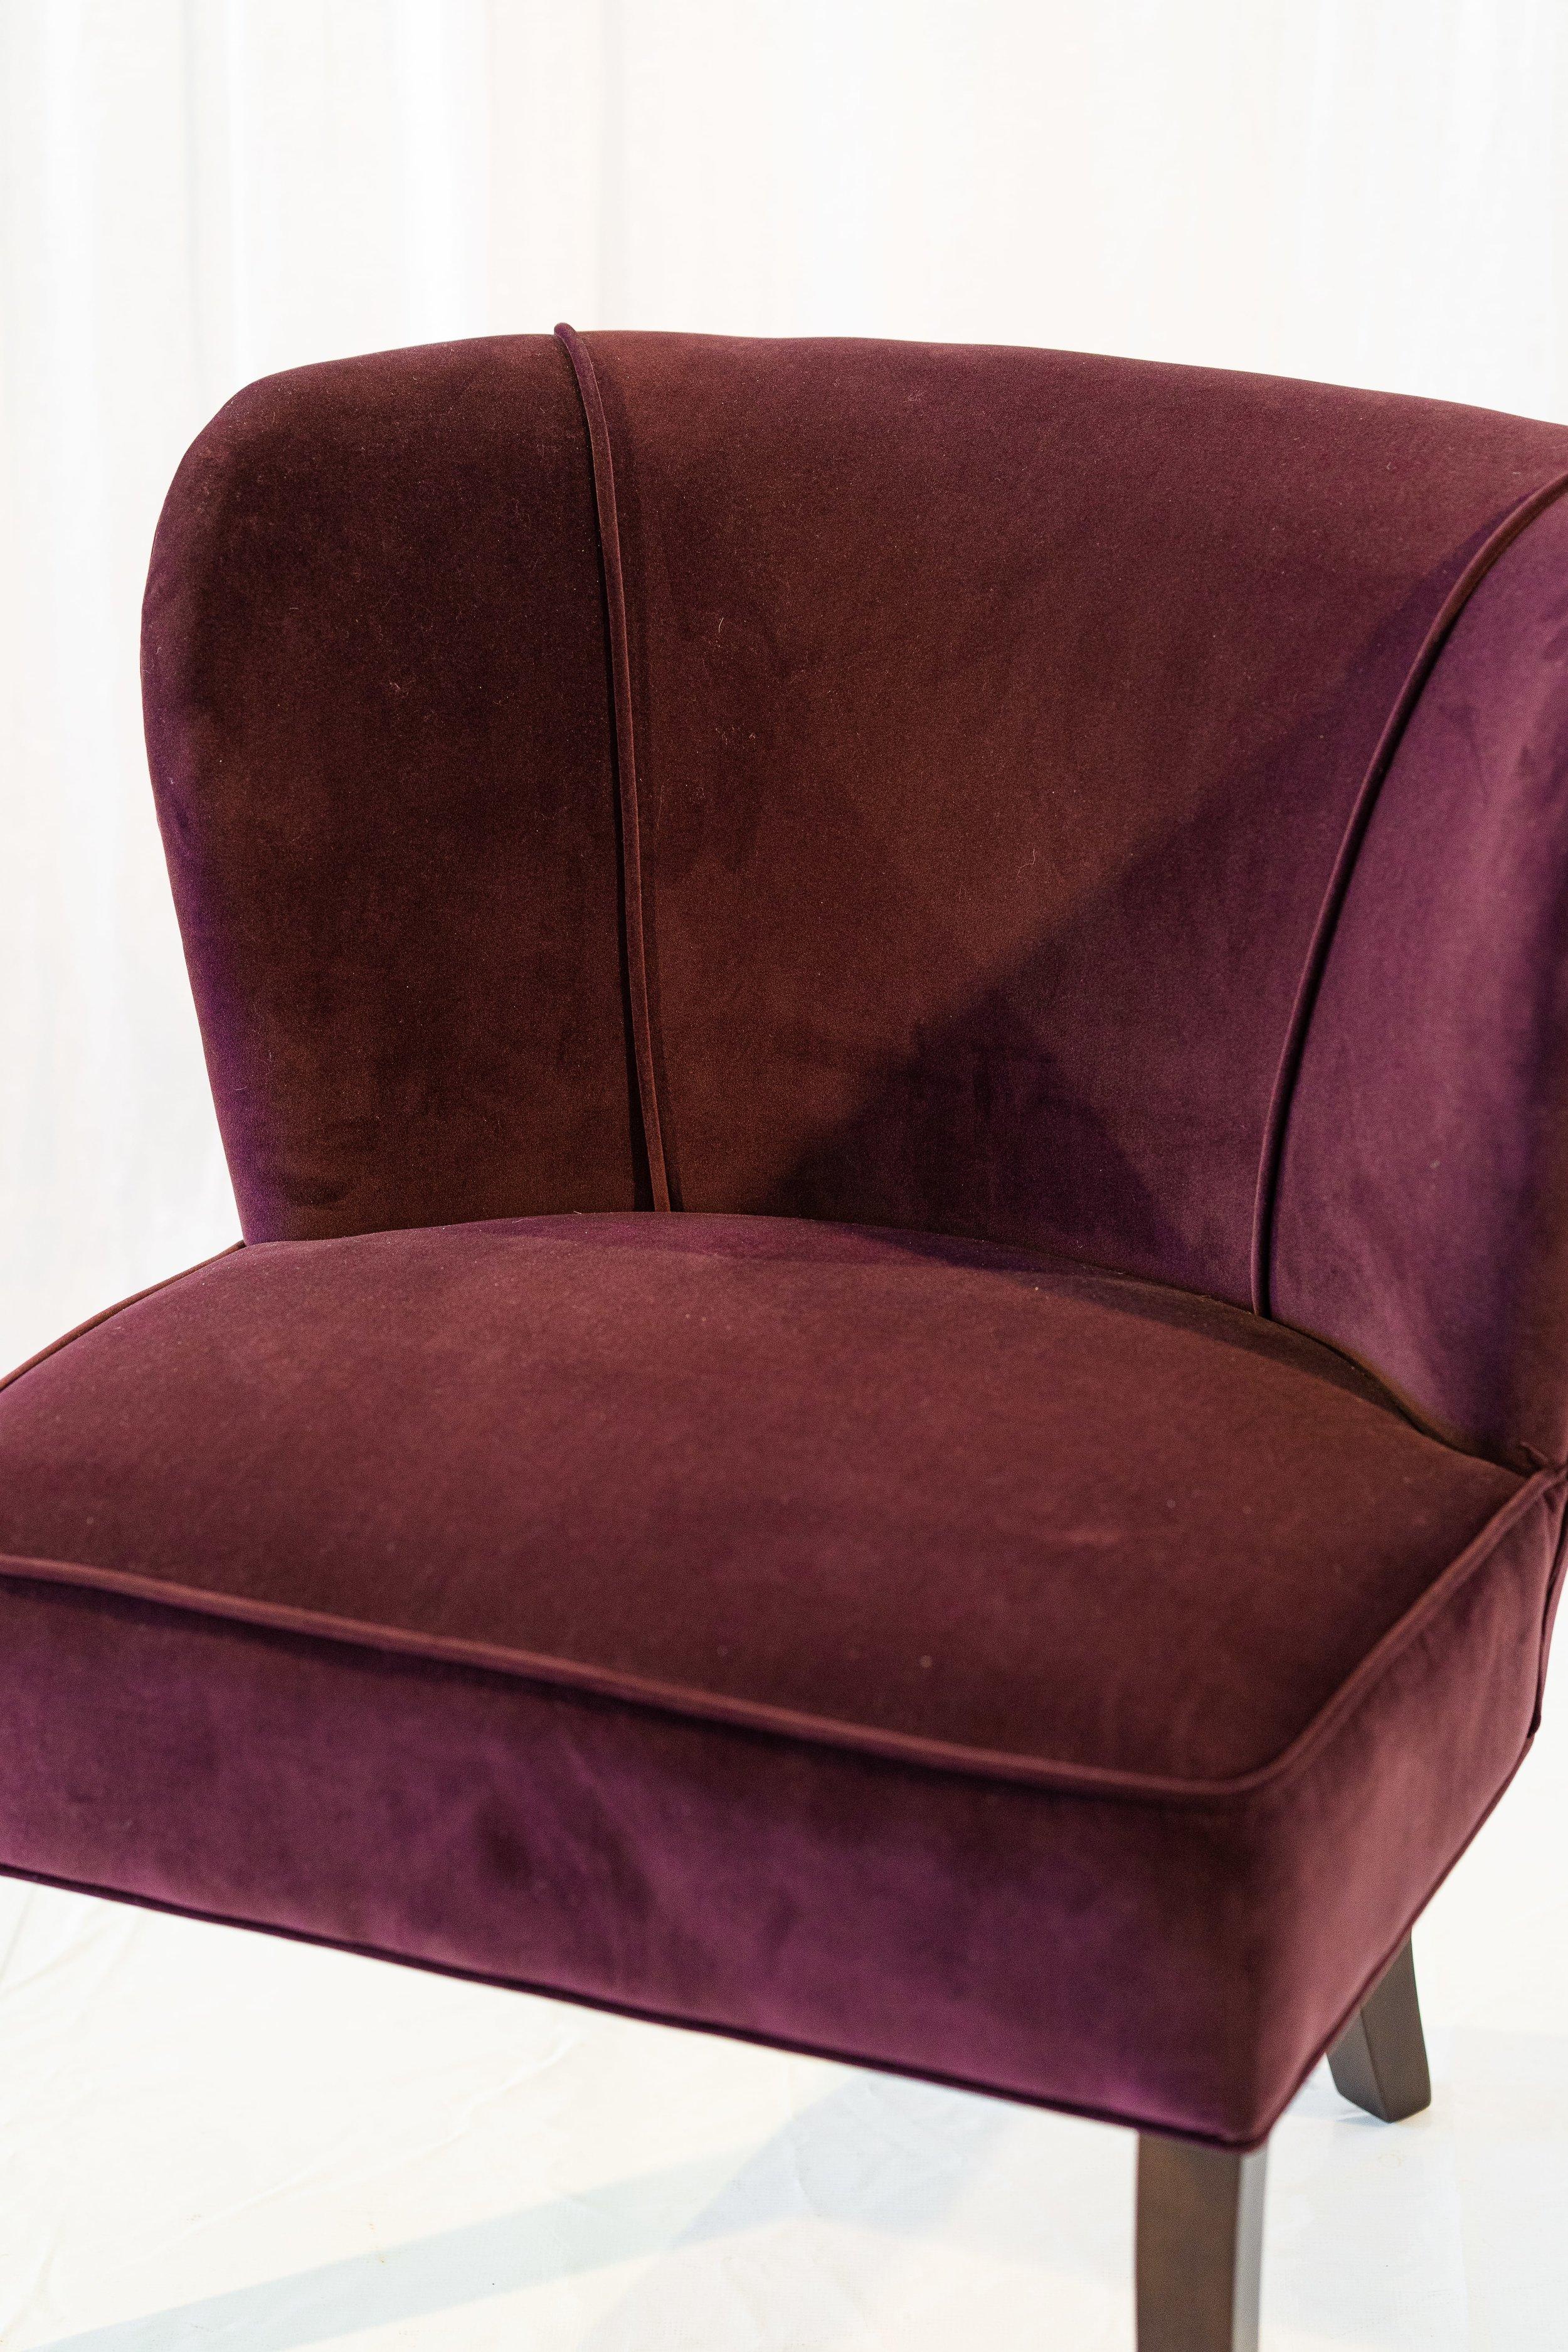 vintage chair images2-10-min.jpg